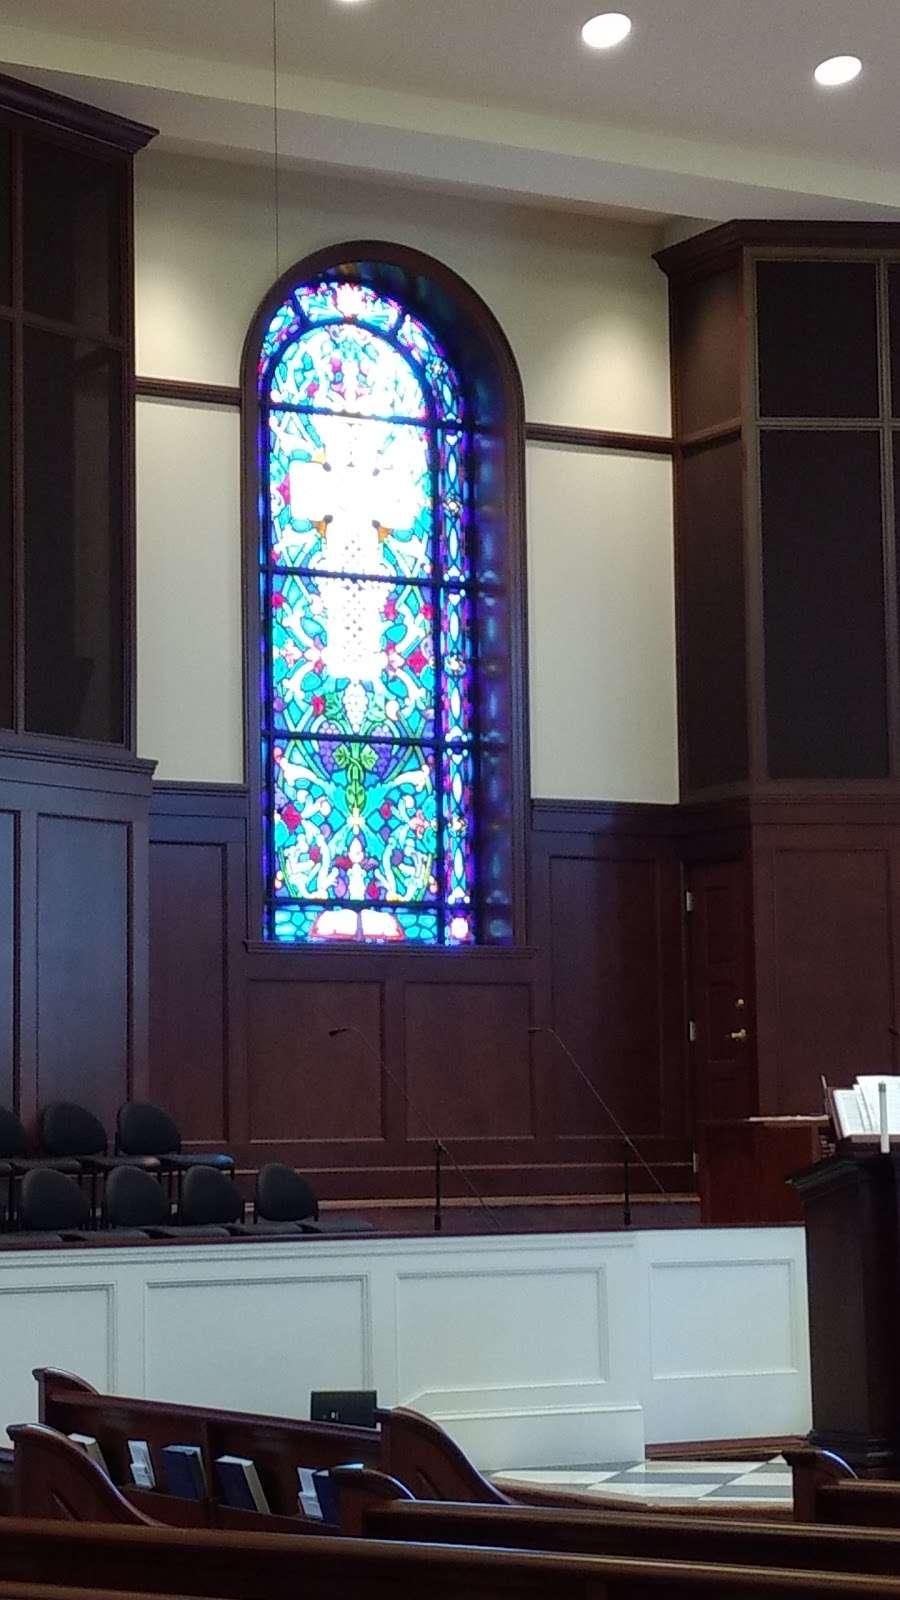 South Mecklenburg Presbyterian Church - church  | Photo 6 of 8 | Address: 8601 Bryant Farms Rd, Charlotte, NC 28277, USA | Phone: (704) 544-0404